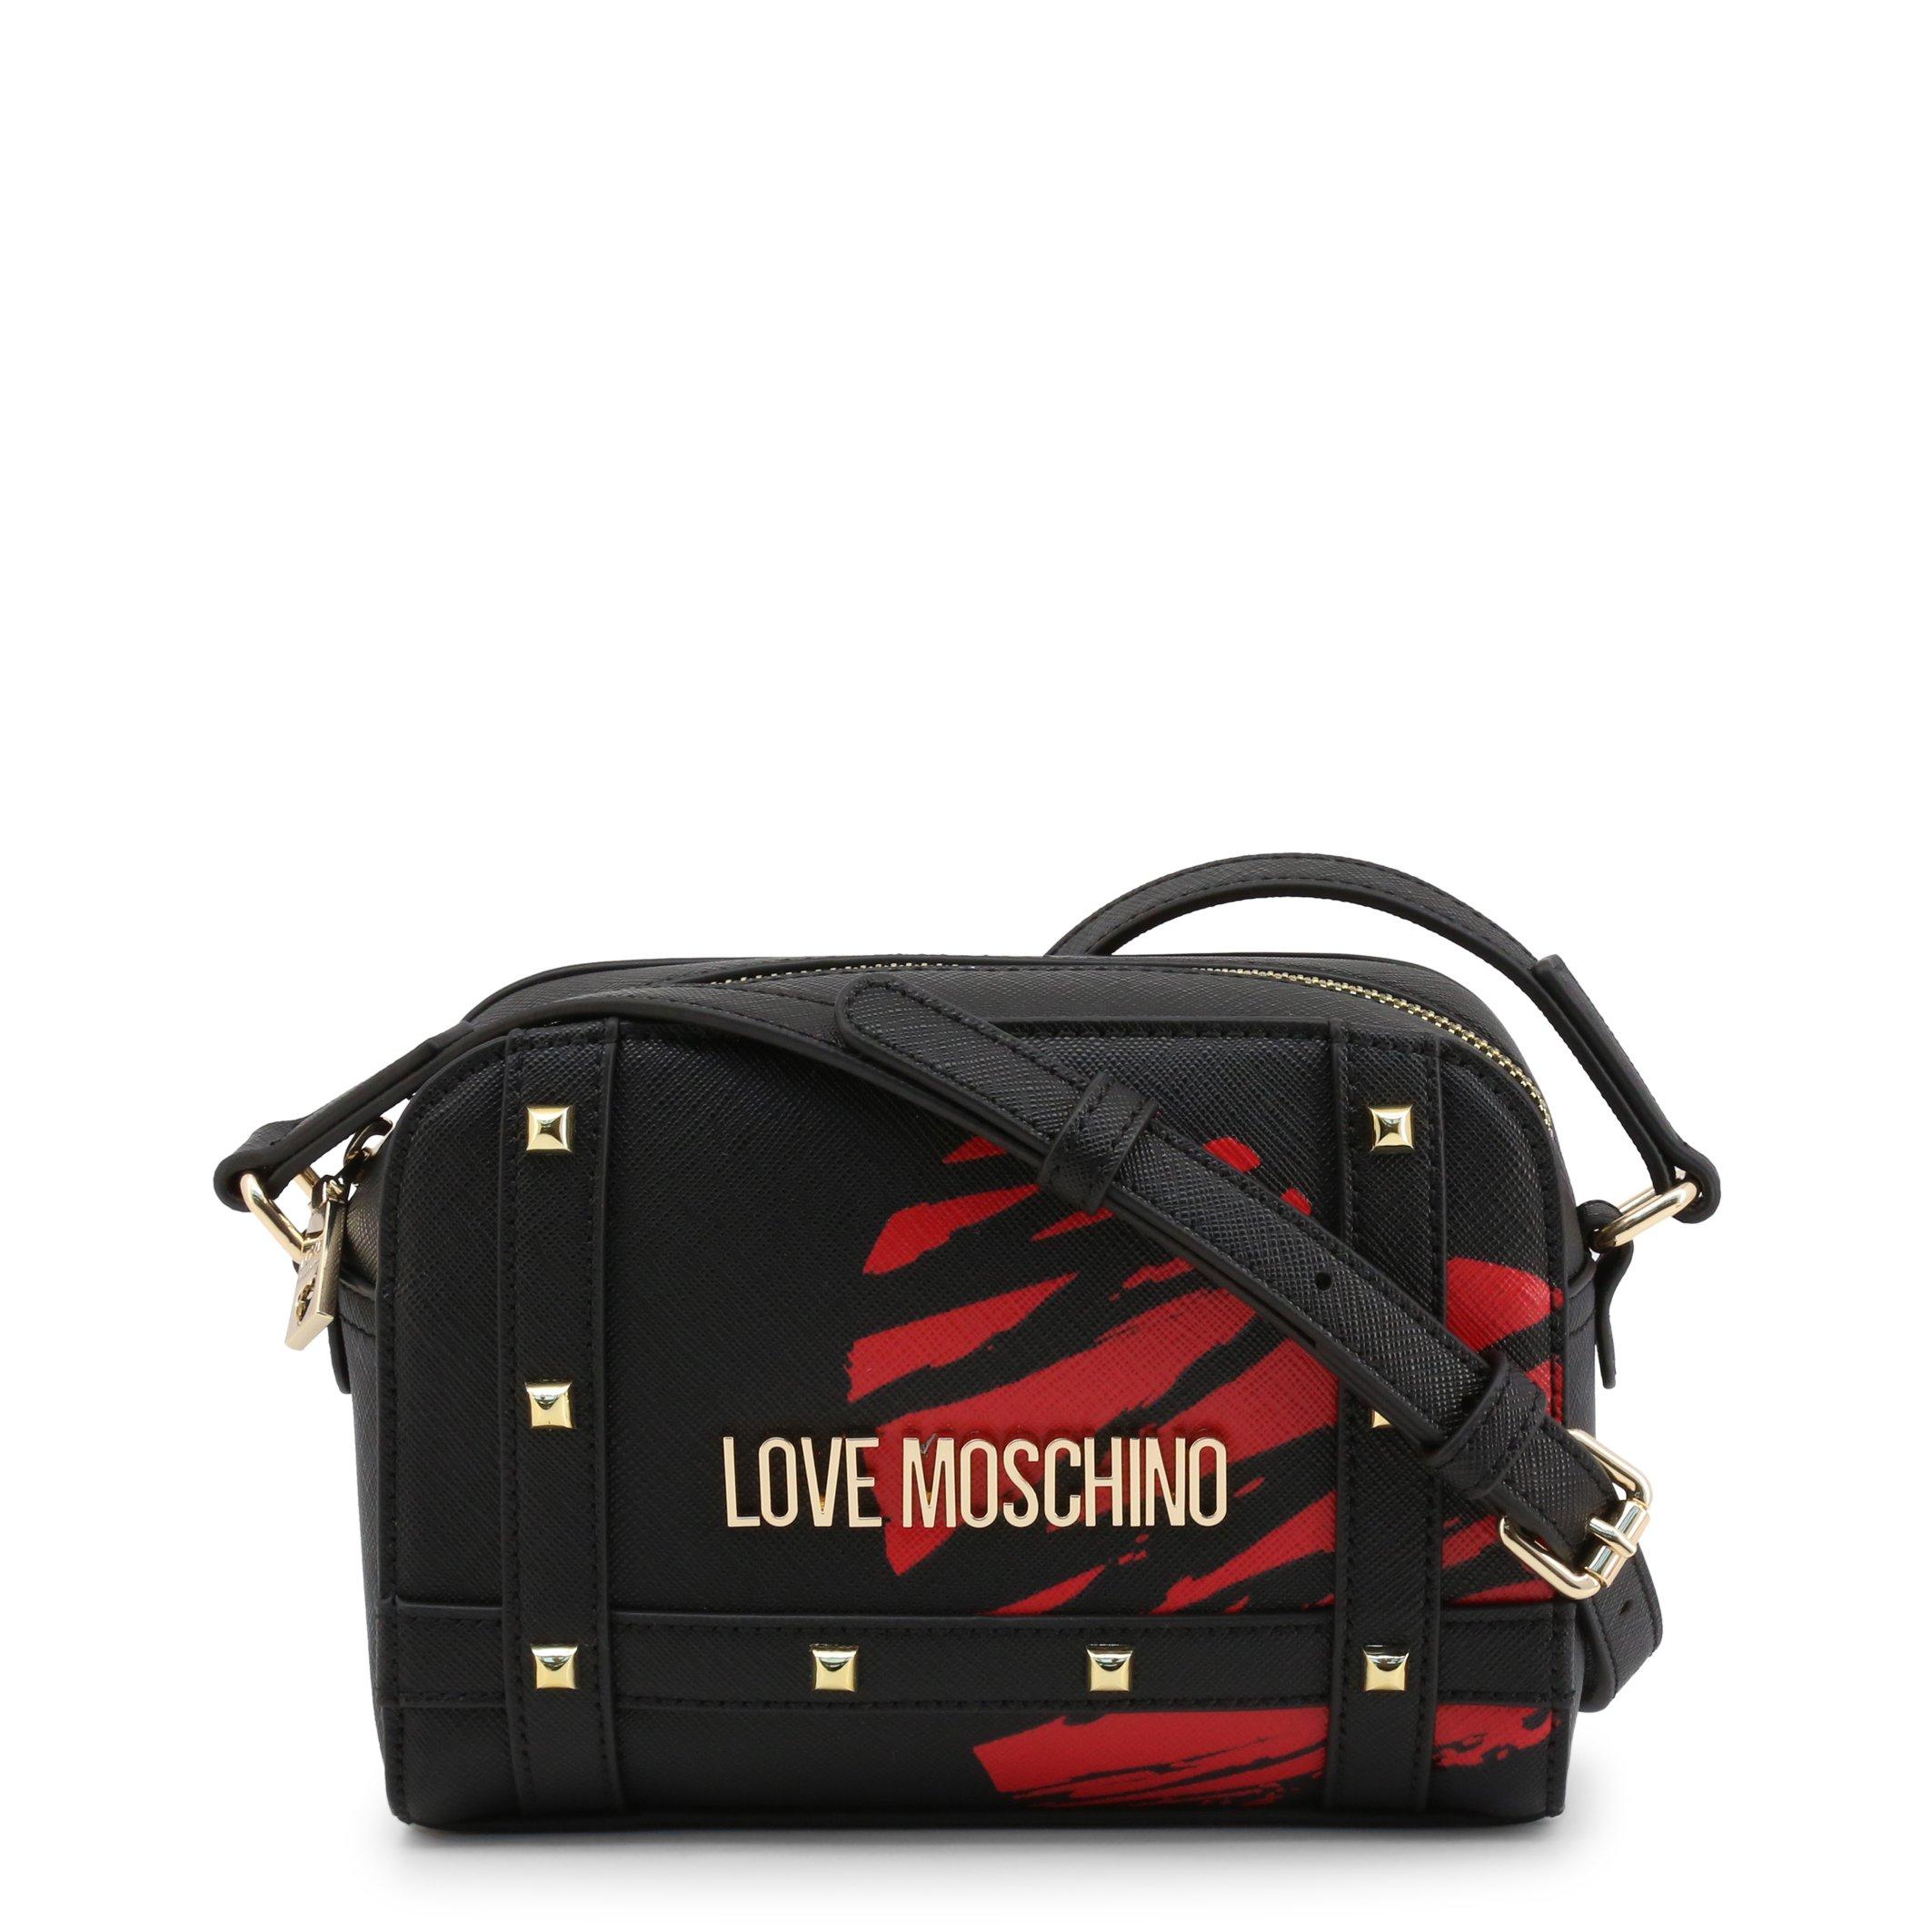 Love Moschino Women's Crossbody Bag Various Colours JC4074PP1CLG1 - black-1 NOSIZE